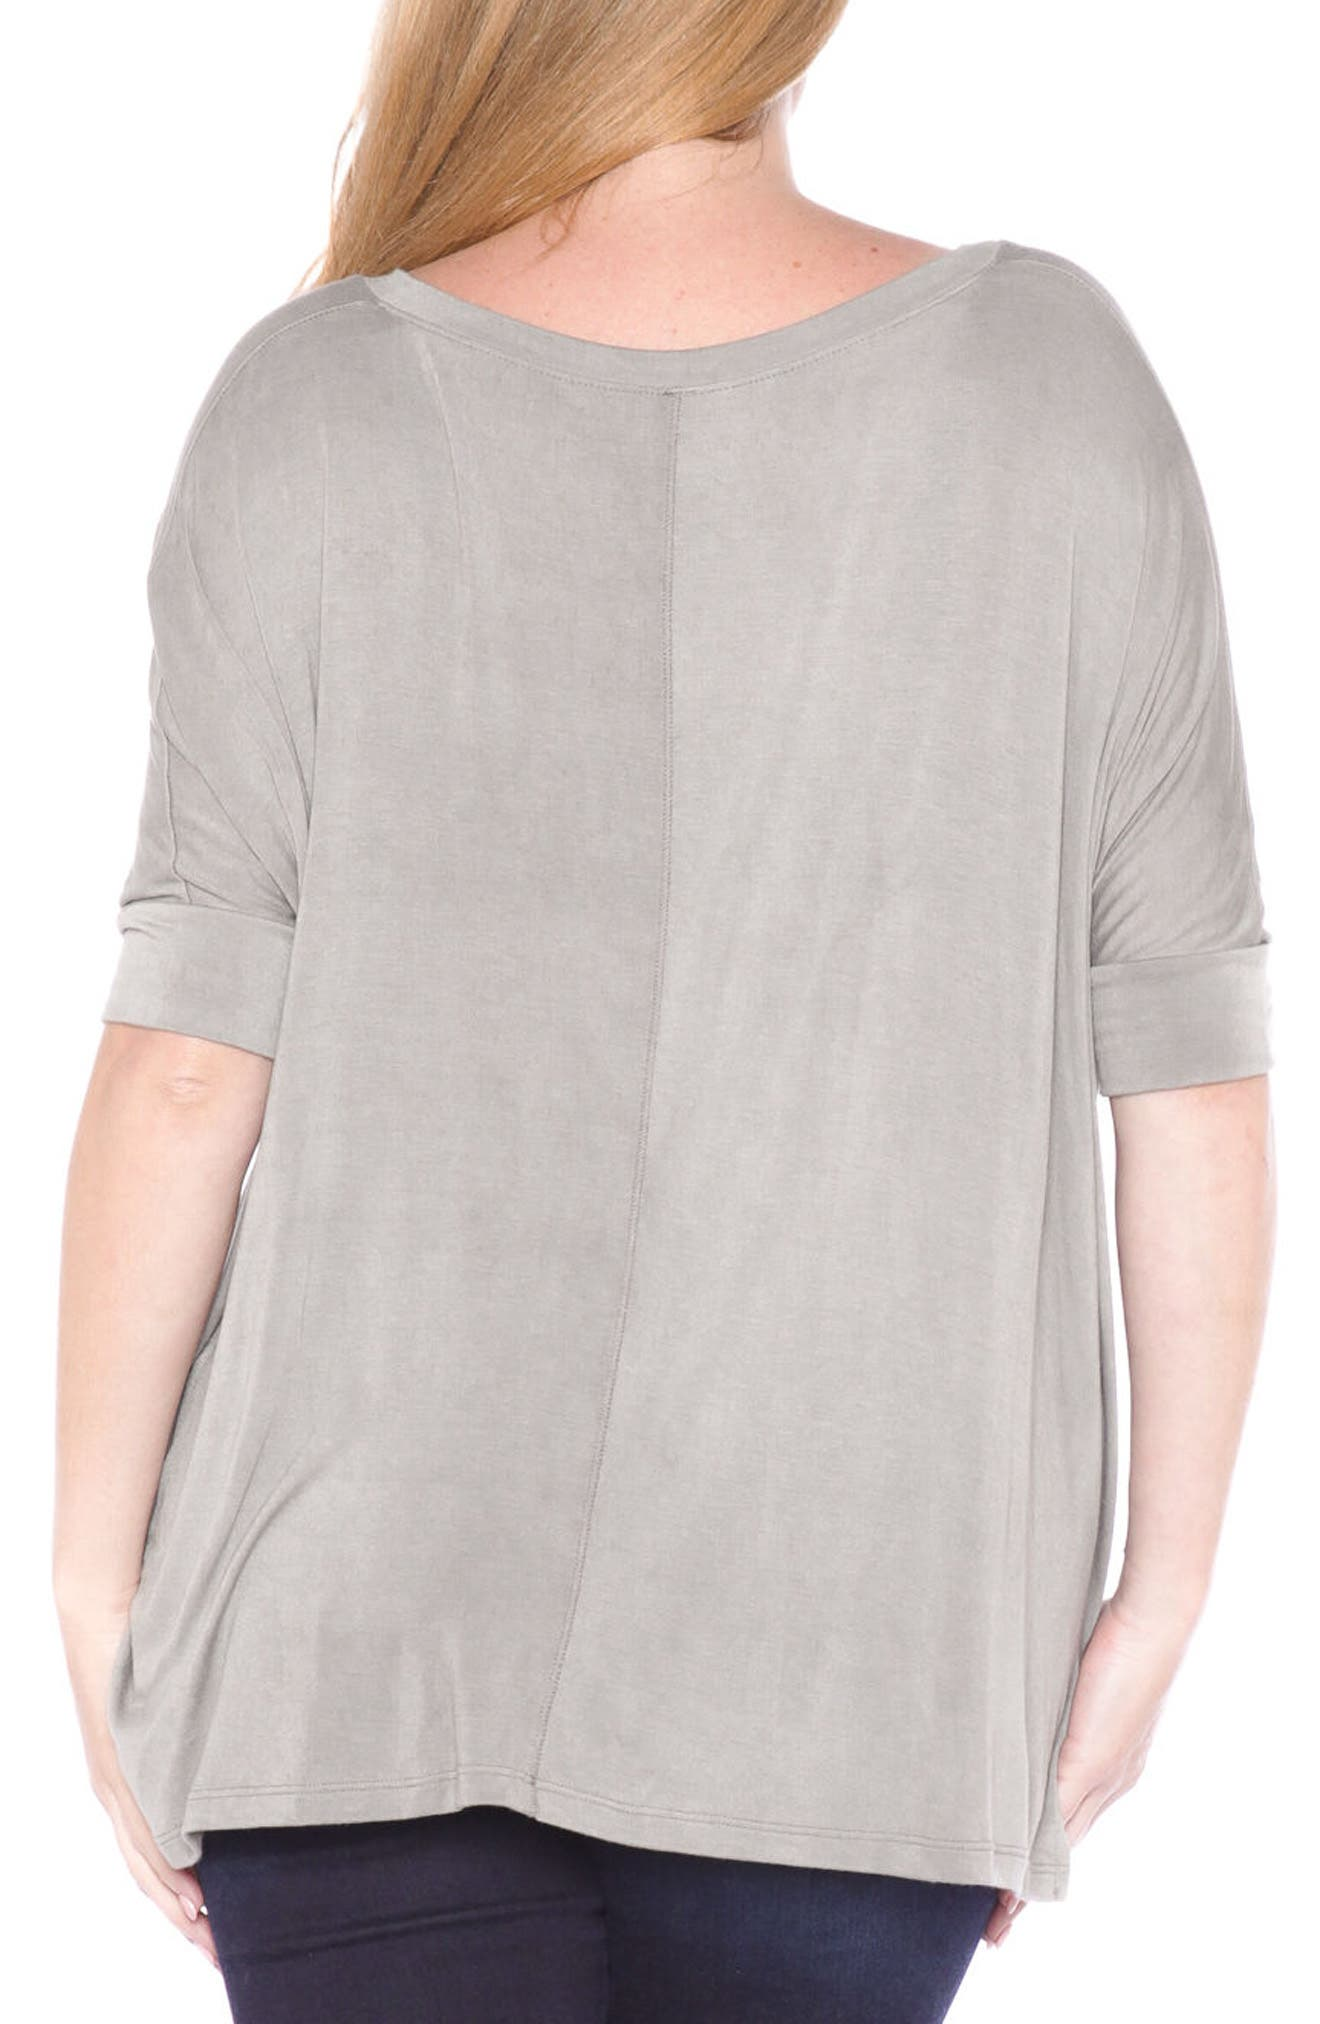 Dolman Sleeve Top,                             Alternate thumbnail 2, color,                             Greystone